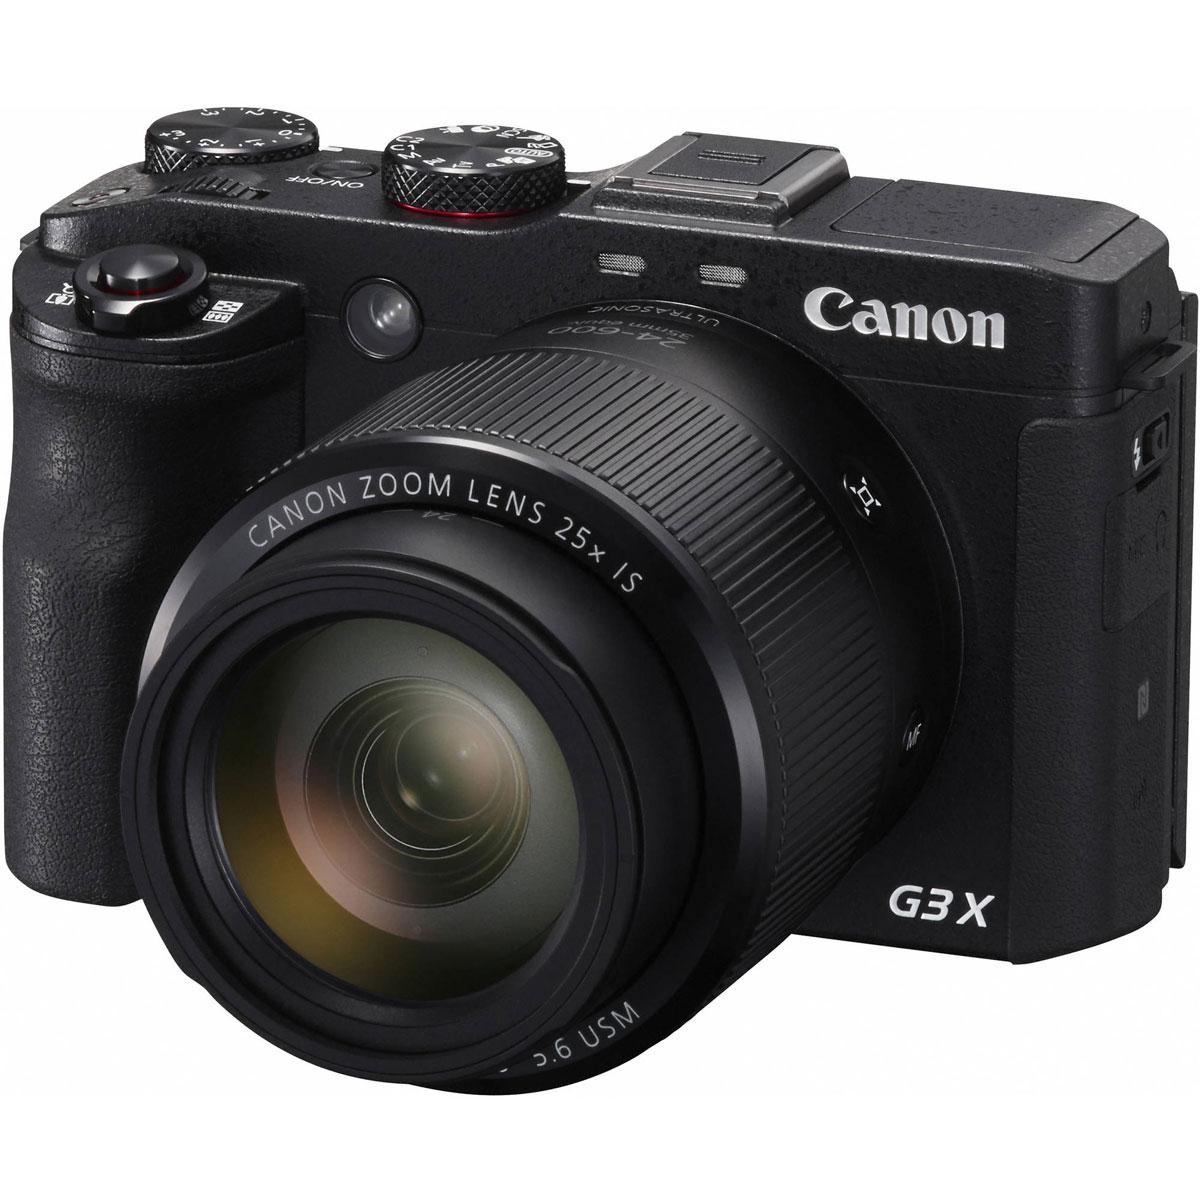 Canon PowerShot G3 X, Black цифровая фотокамера 0106C002